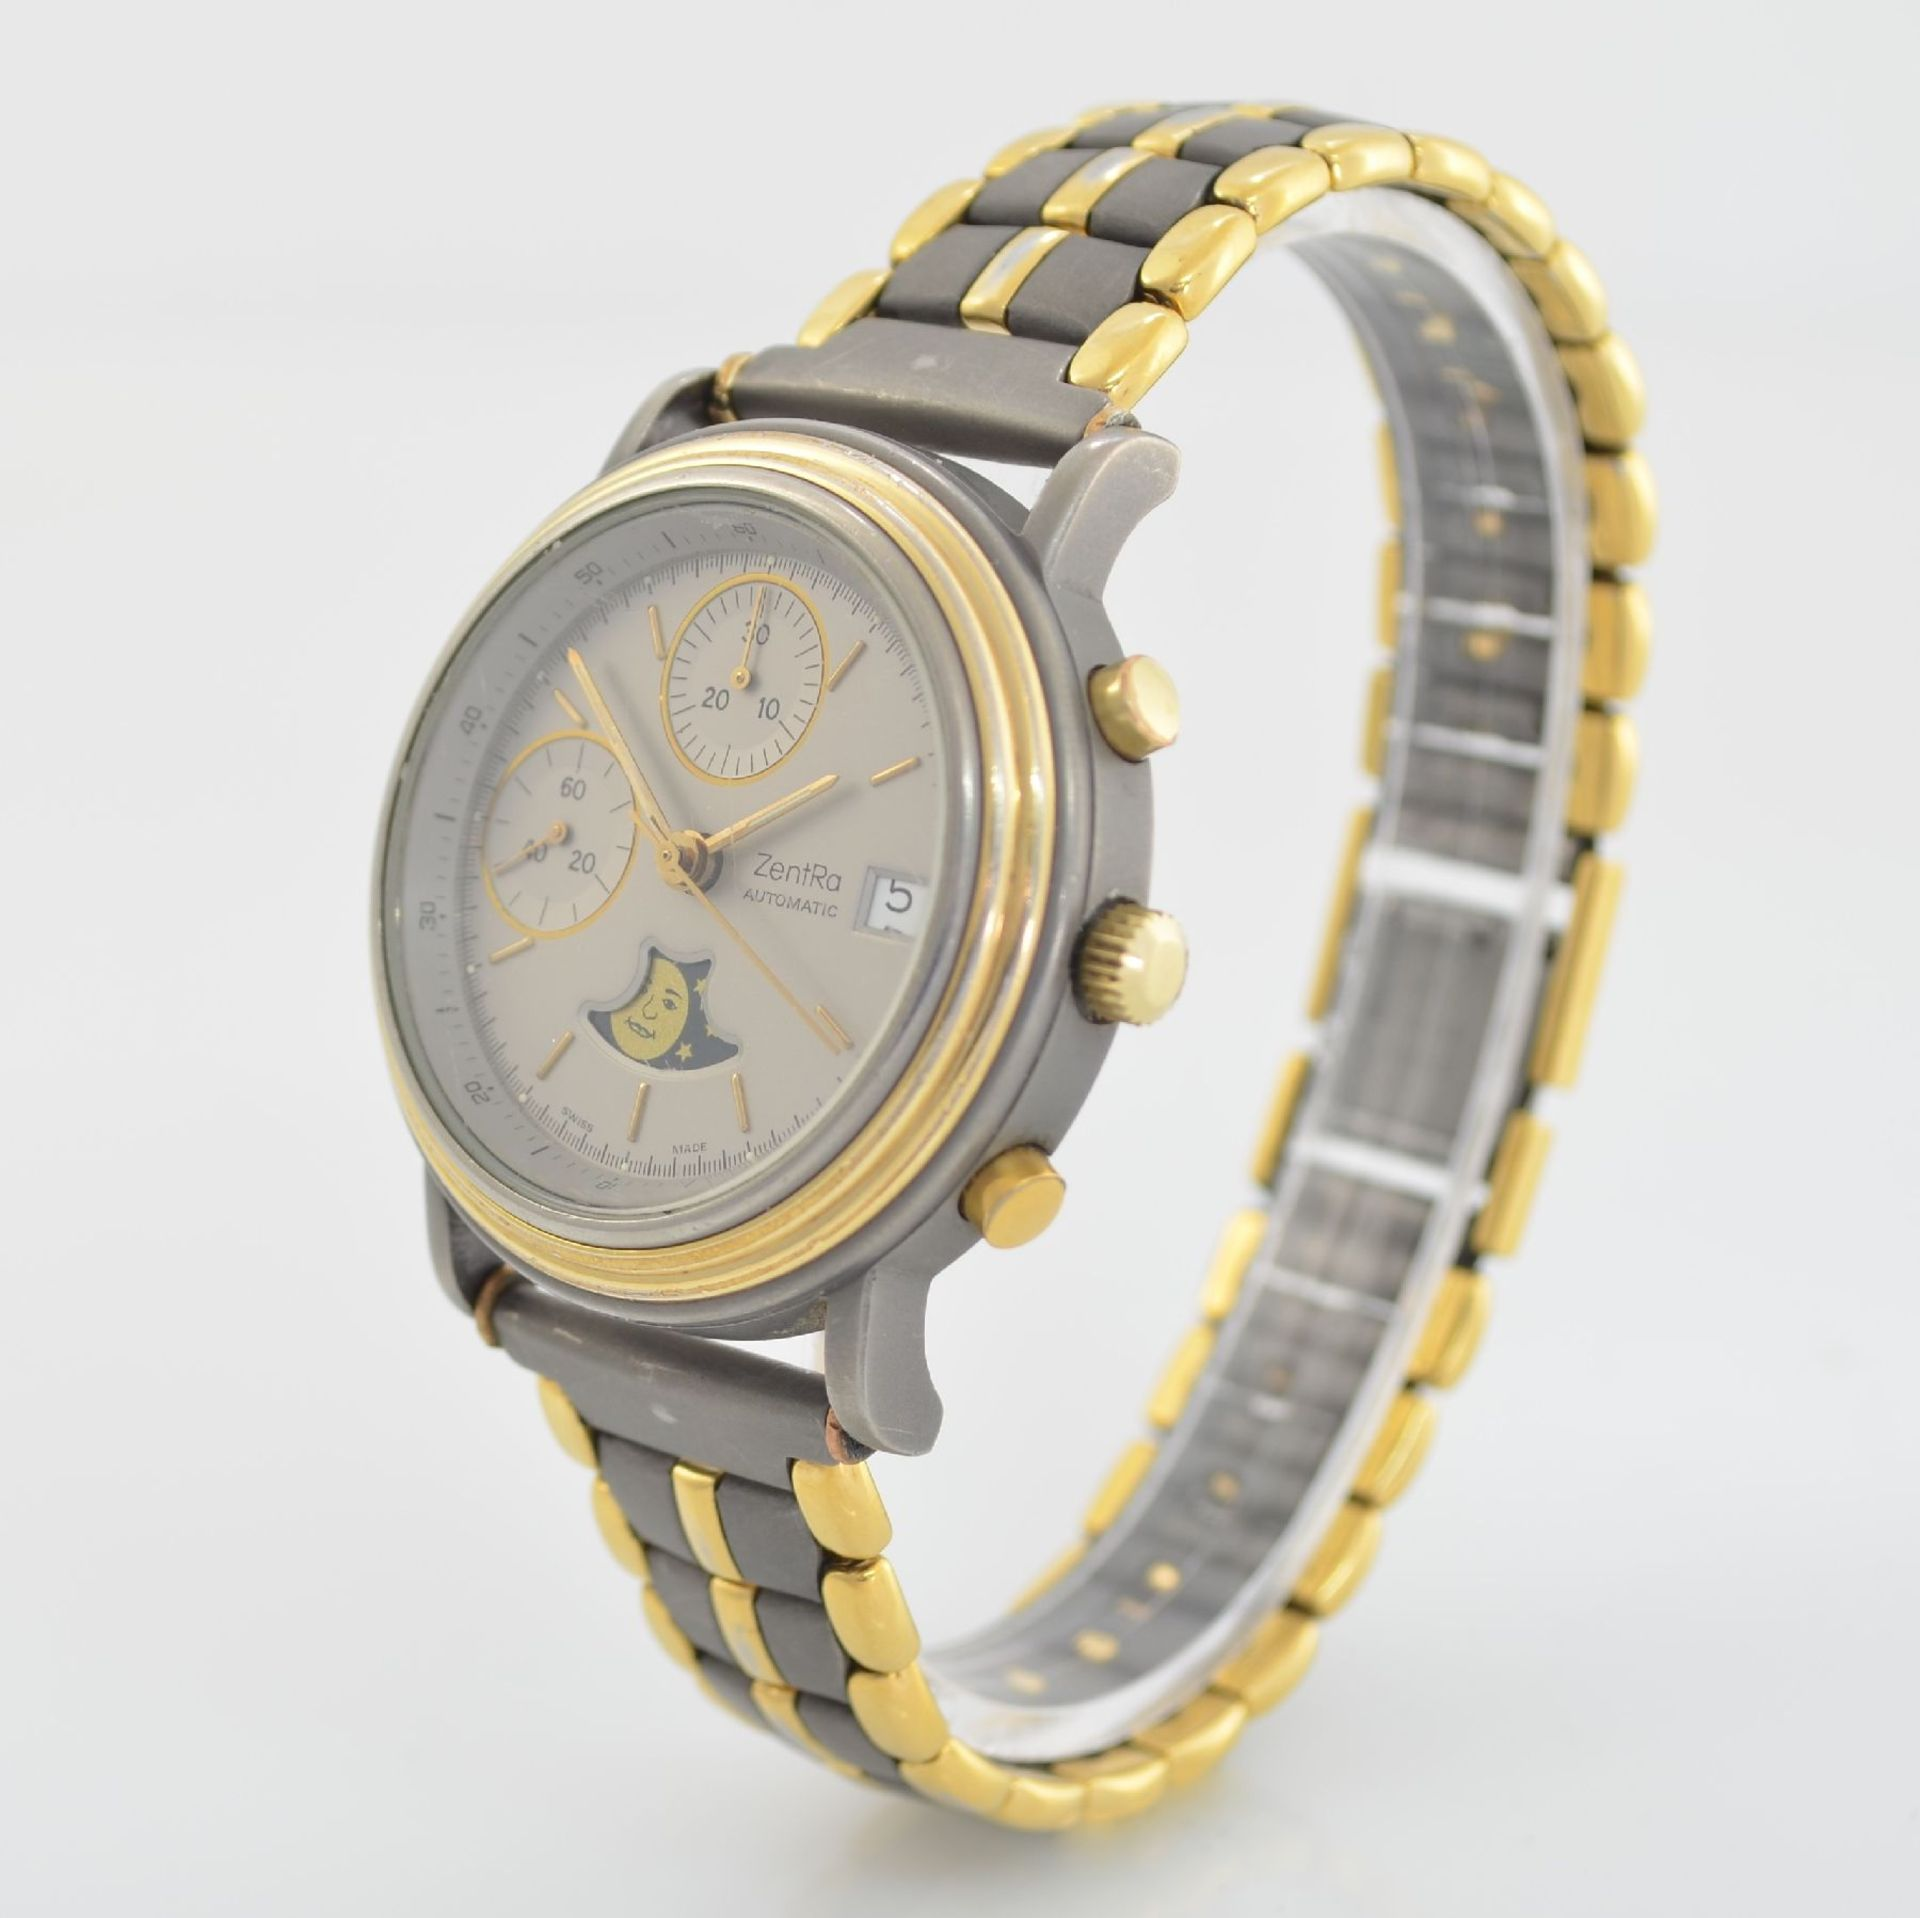 ZENTRA Herrenarmbanduhr Armbandchronograph, Automatik, Schweiz um 1987, Titangeh. inkl. - Bild 3 aus 6